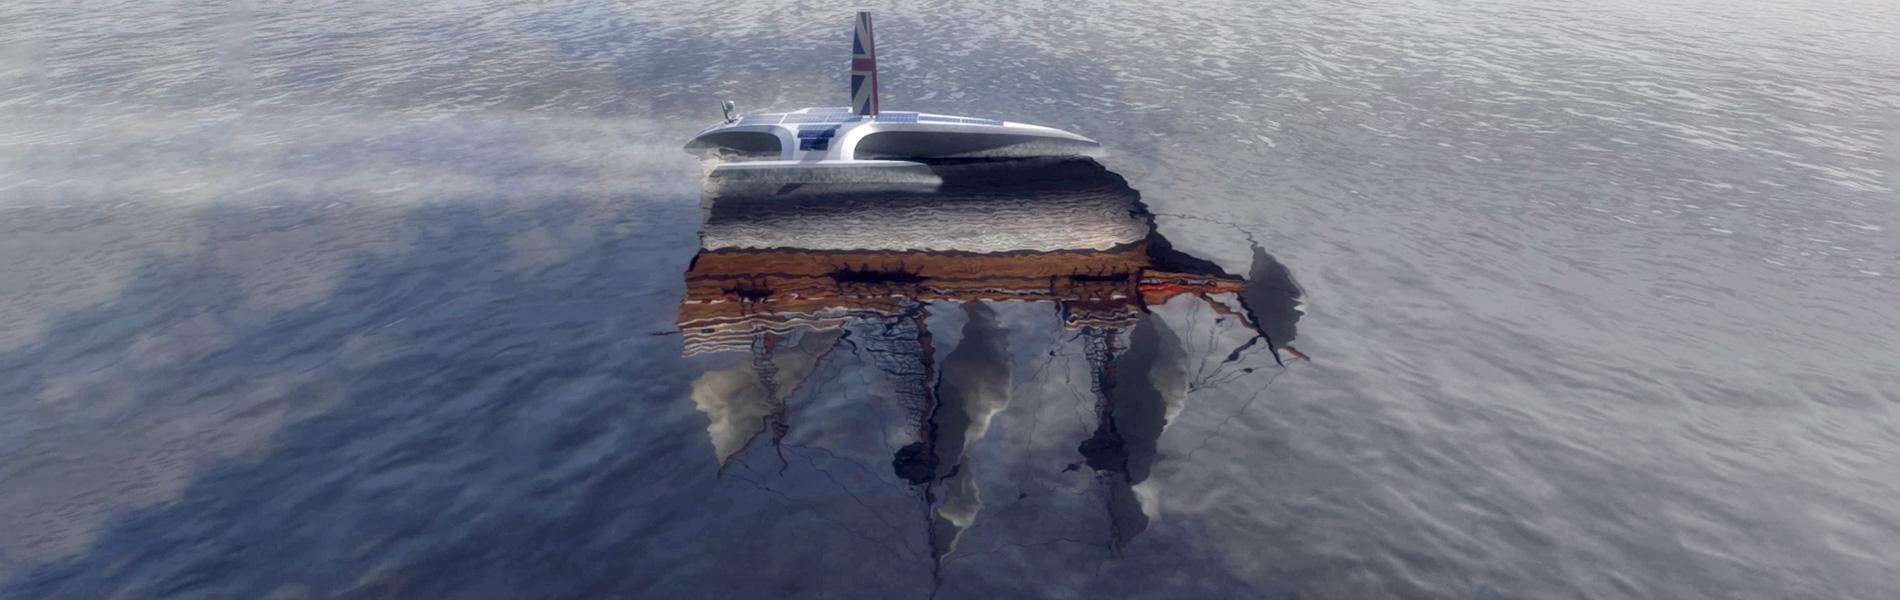 IBM Boards the Mayflower Autonomous Ship Project